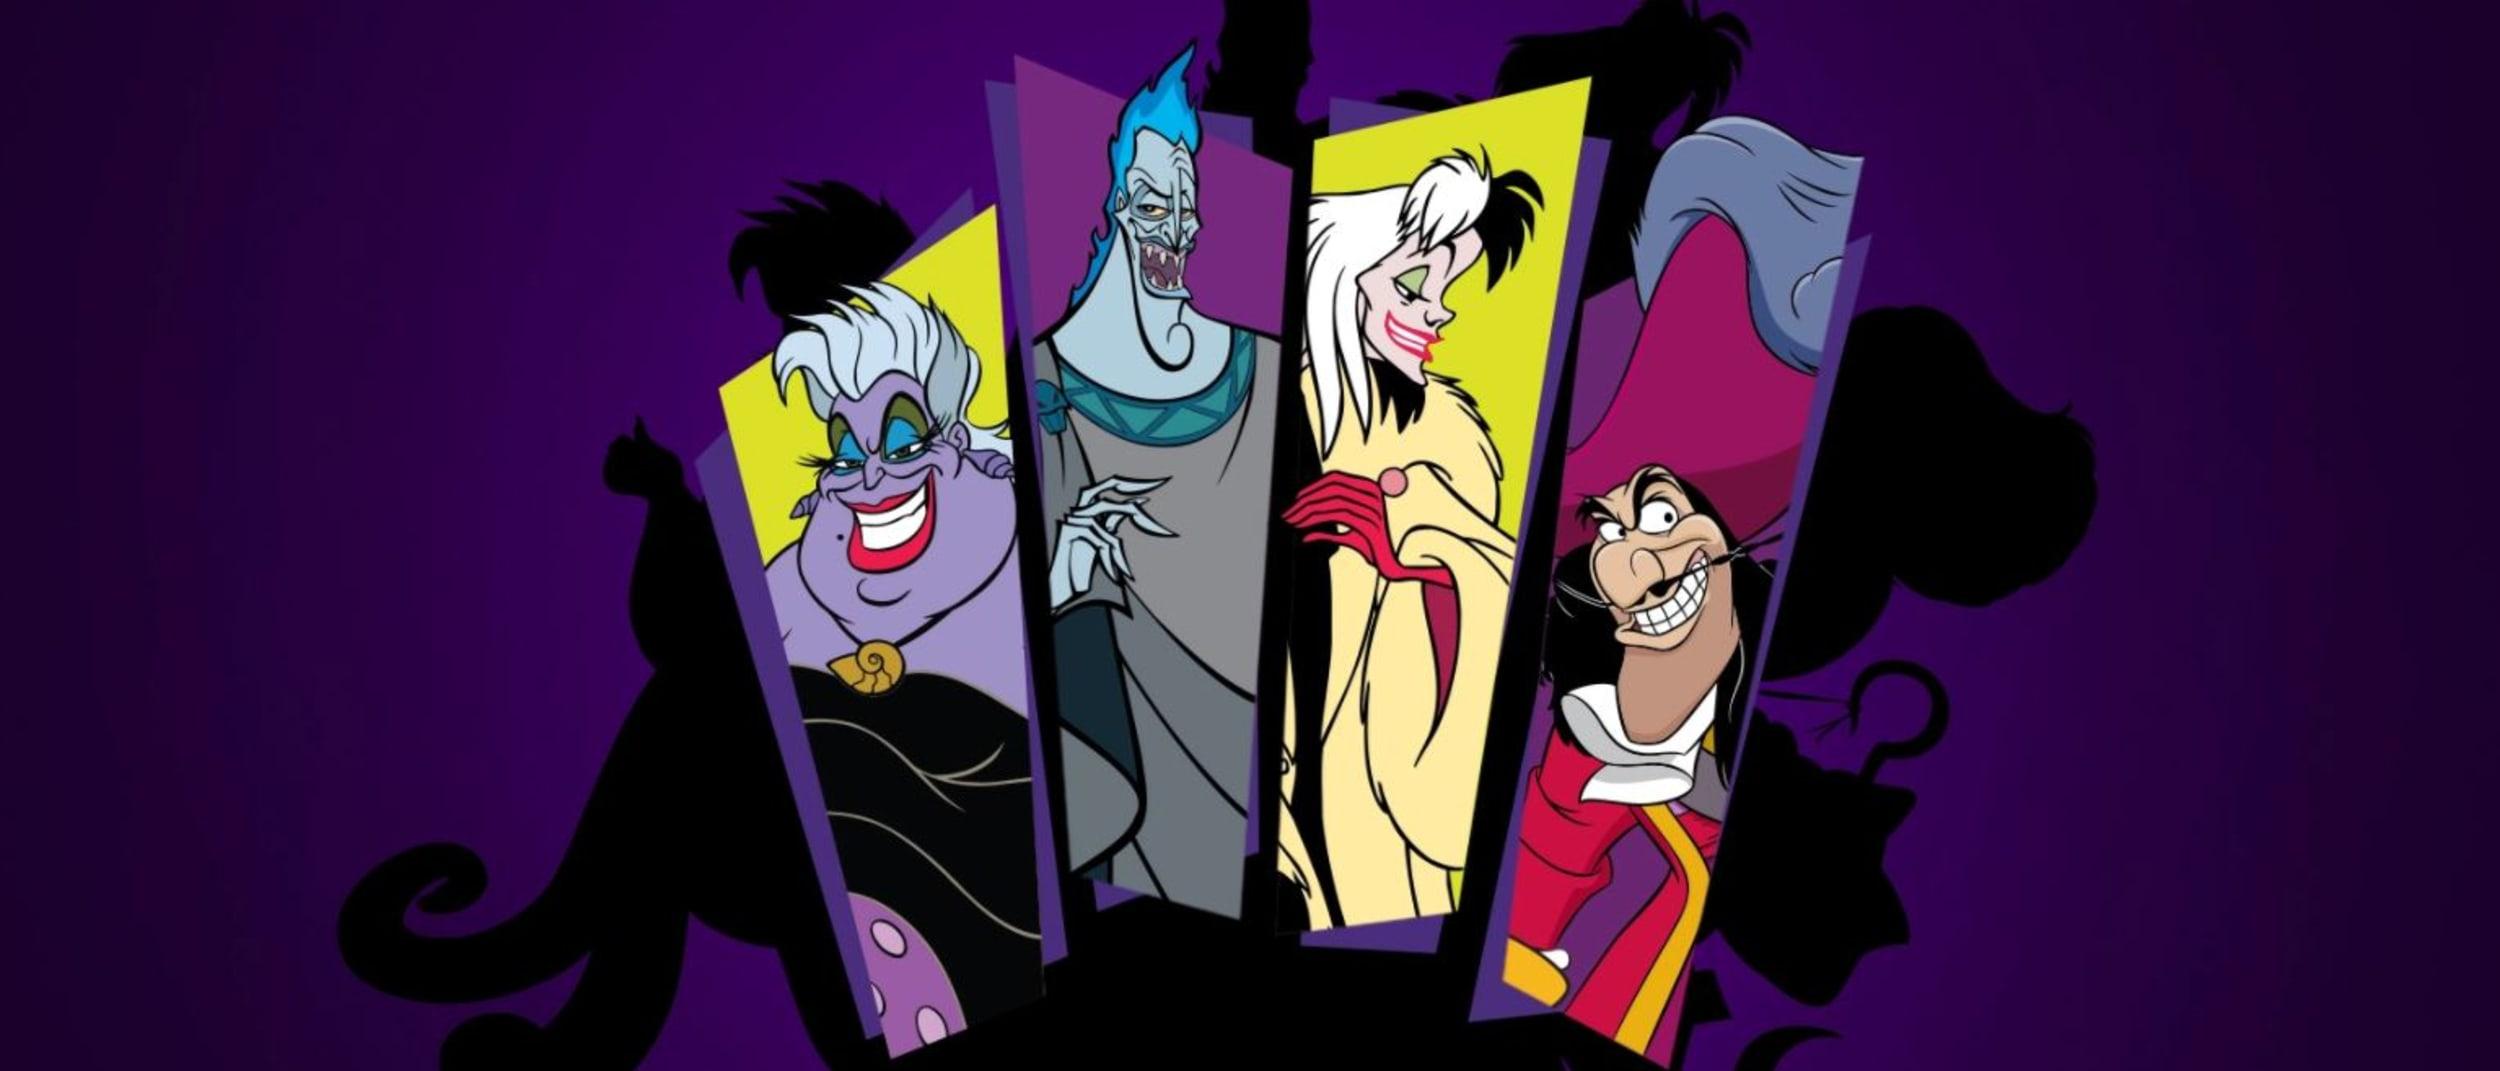 Disney Villains Film Festival at Event Cinemas